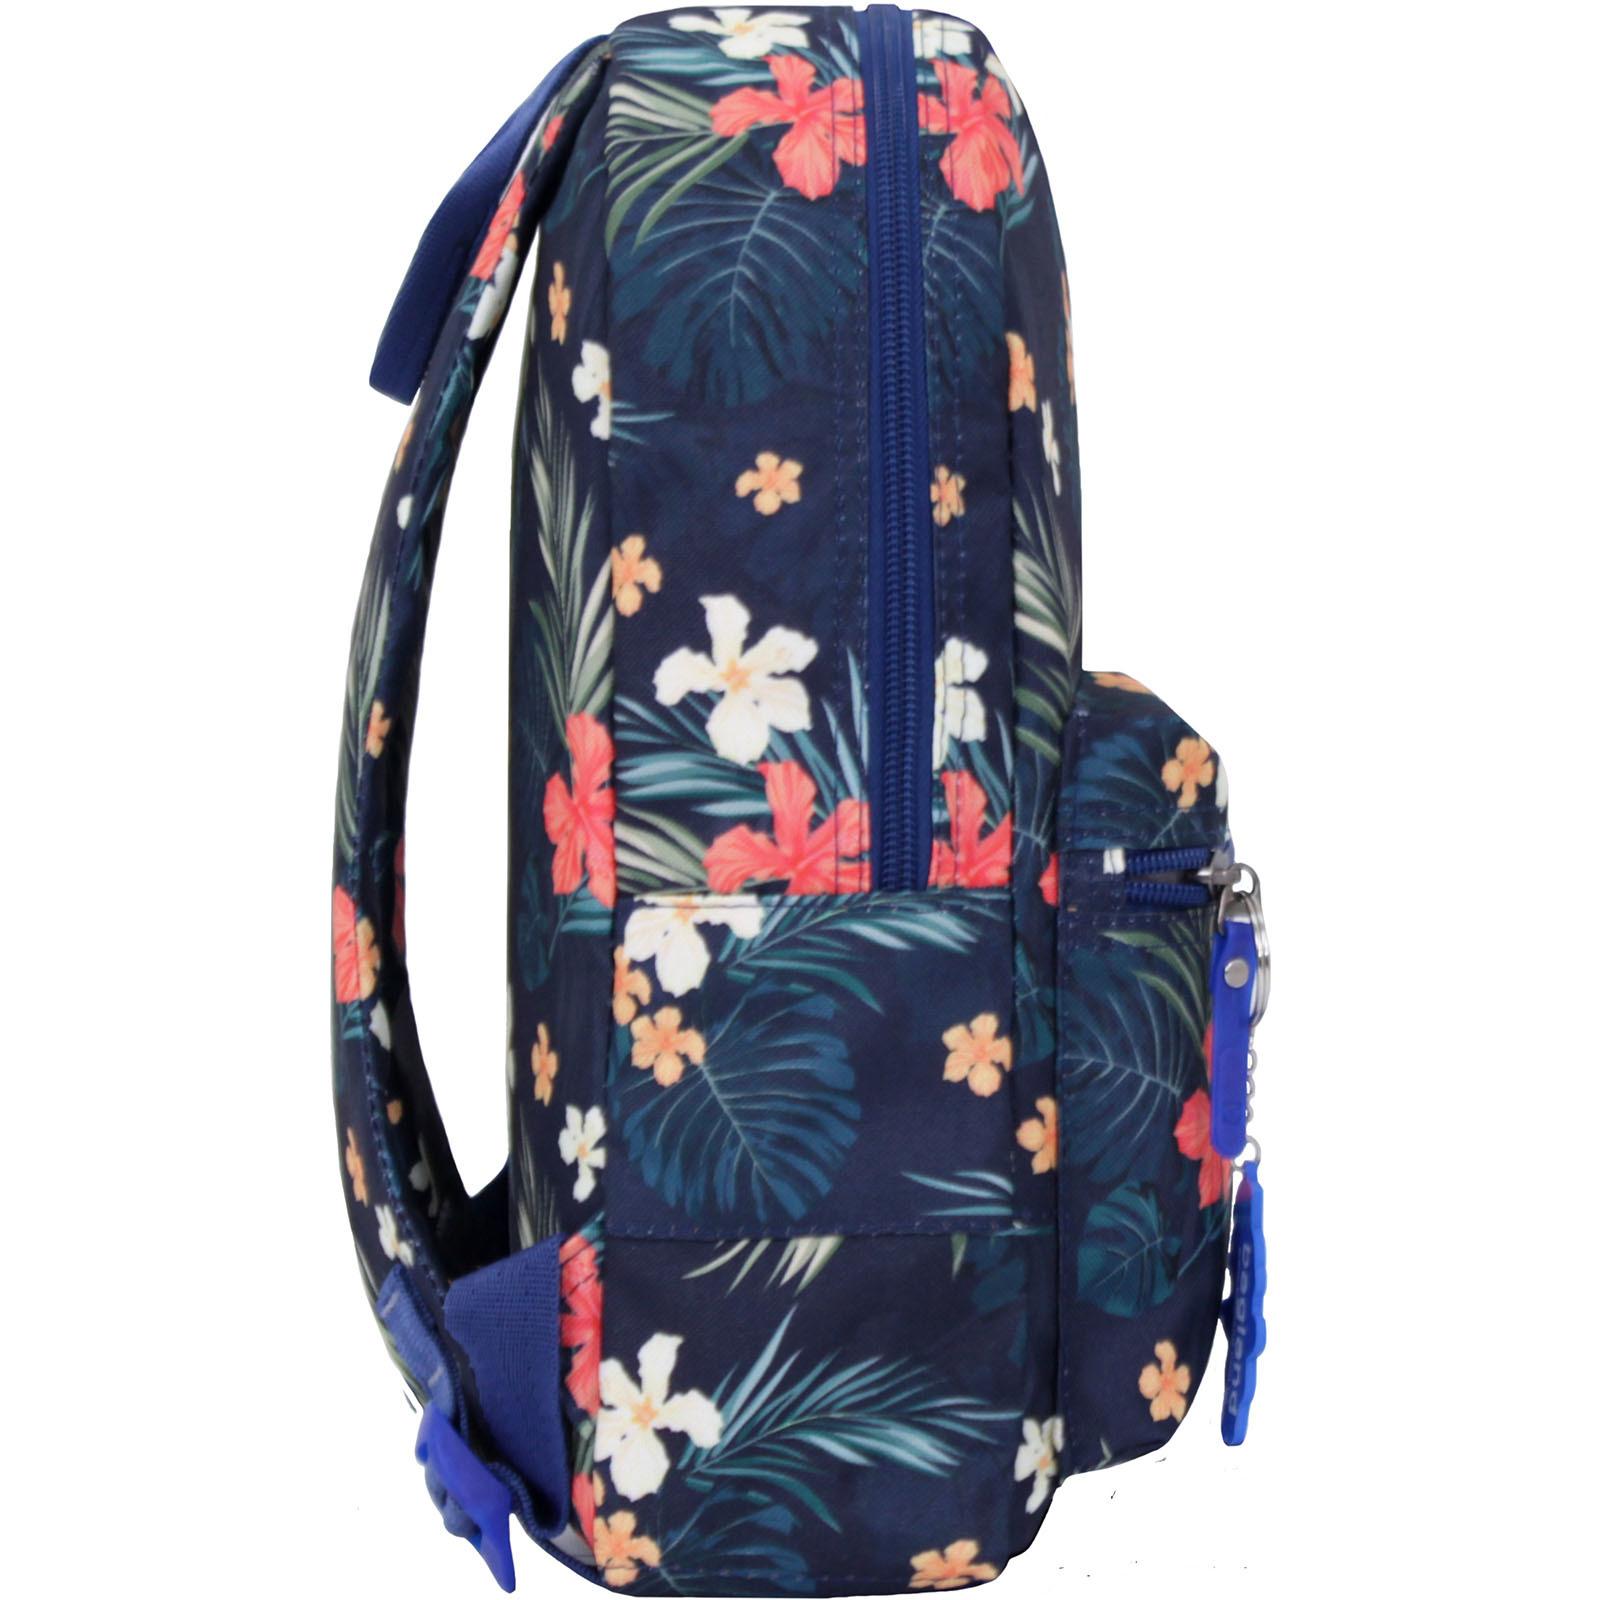 Рюкзак Bagland Молодежный mini суб (цветы) (00508664) фото 2